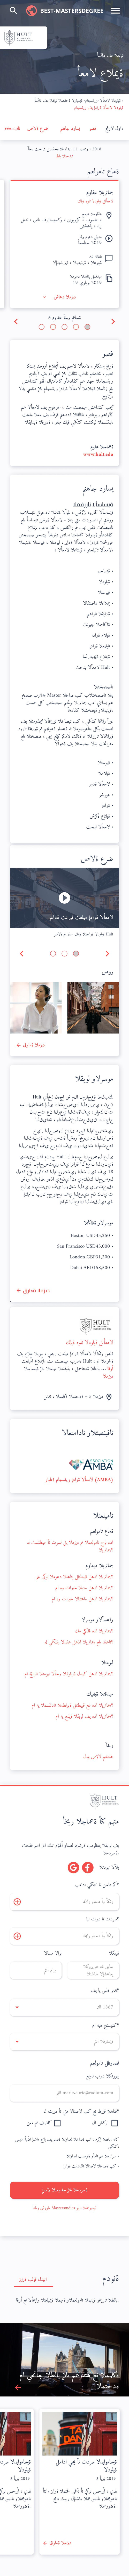 A program page in Arabic